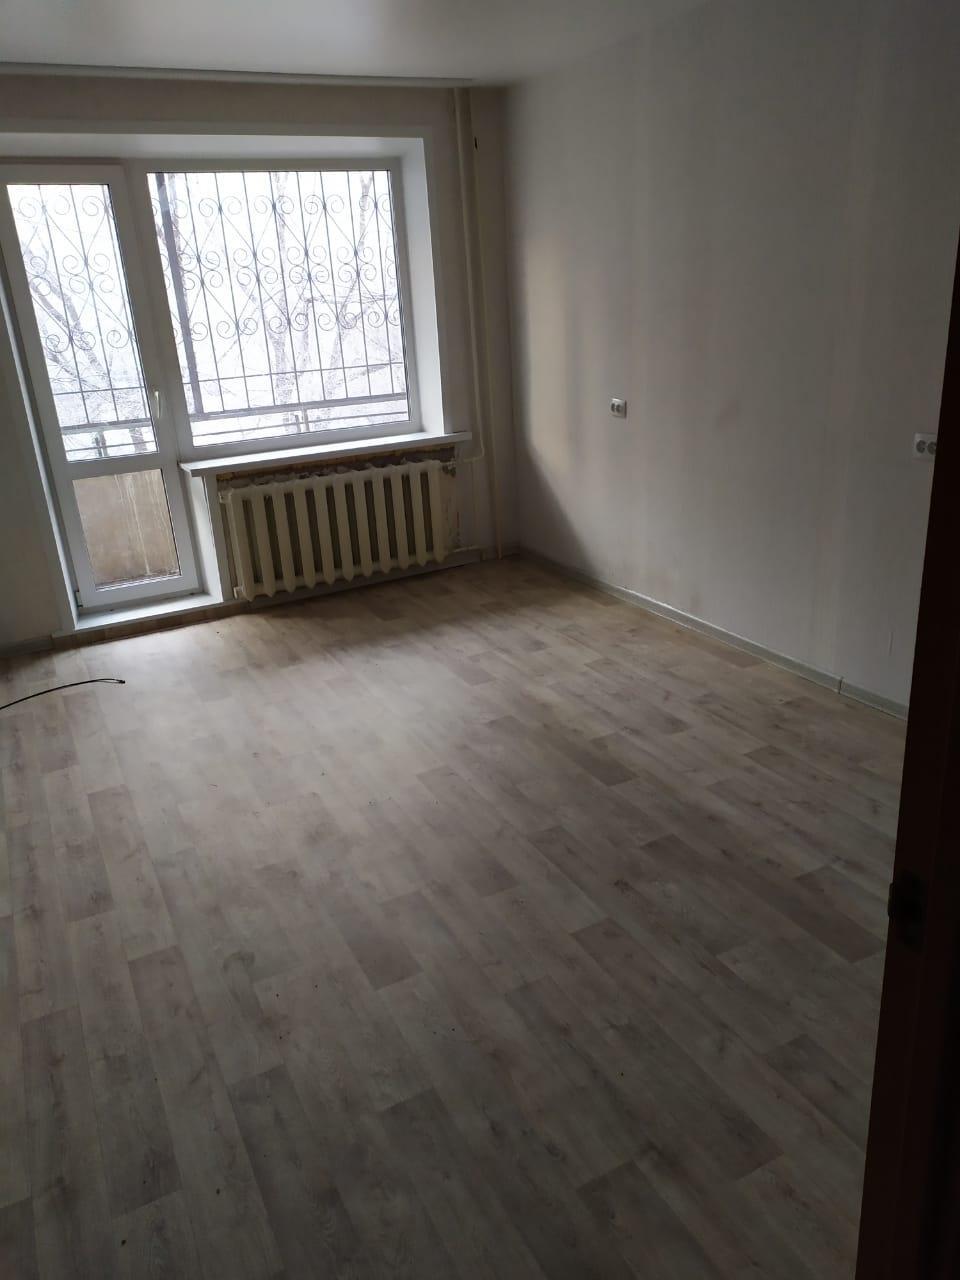 3к квартира улица Гастелло, 32 | 16000 | аренда в Красноярске фото 6